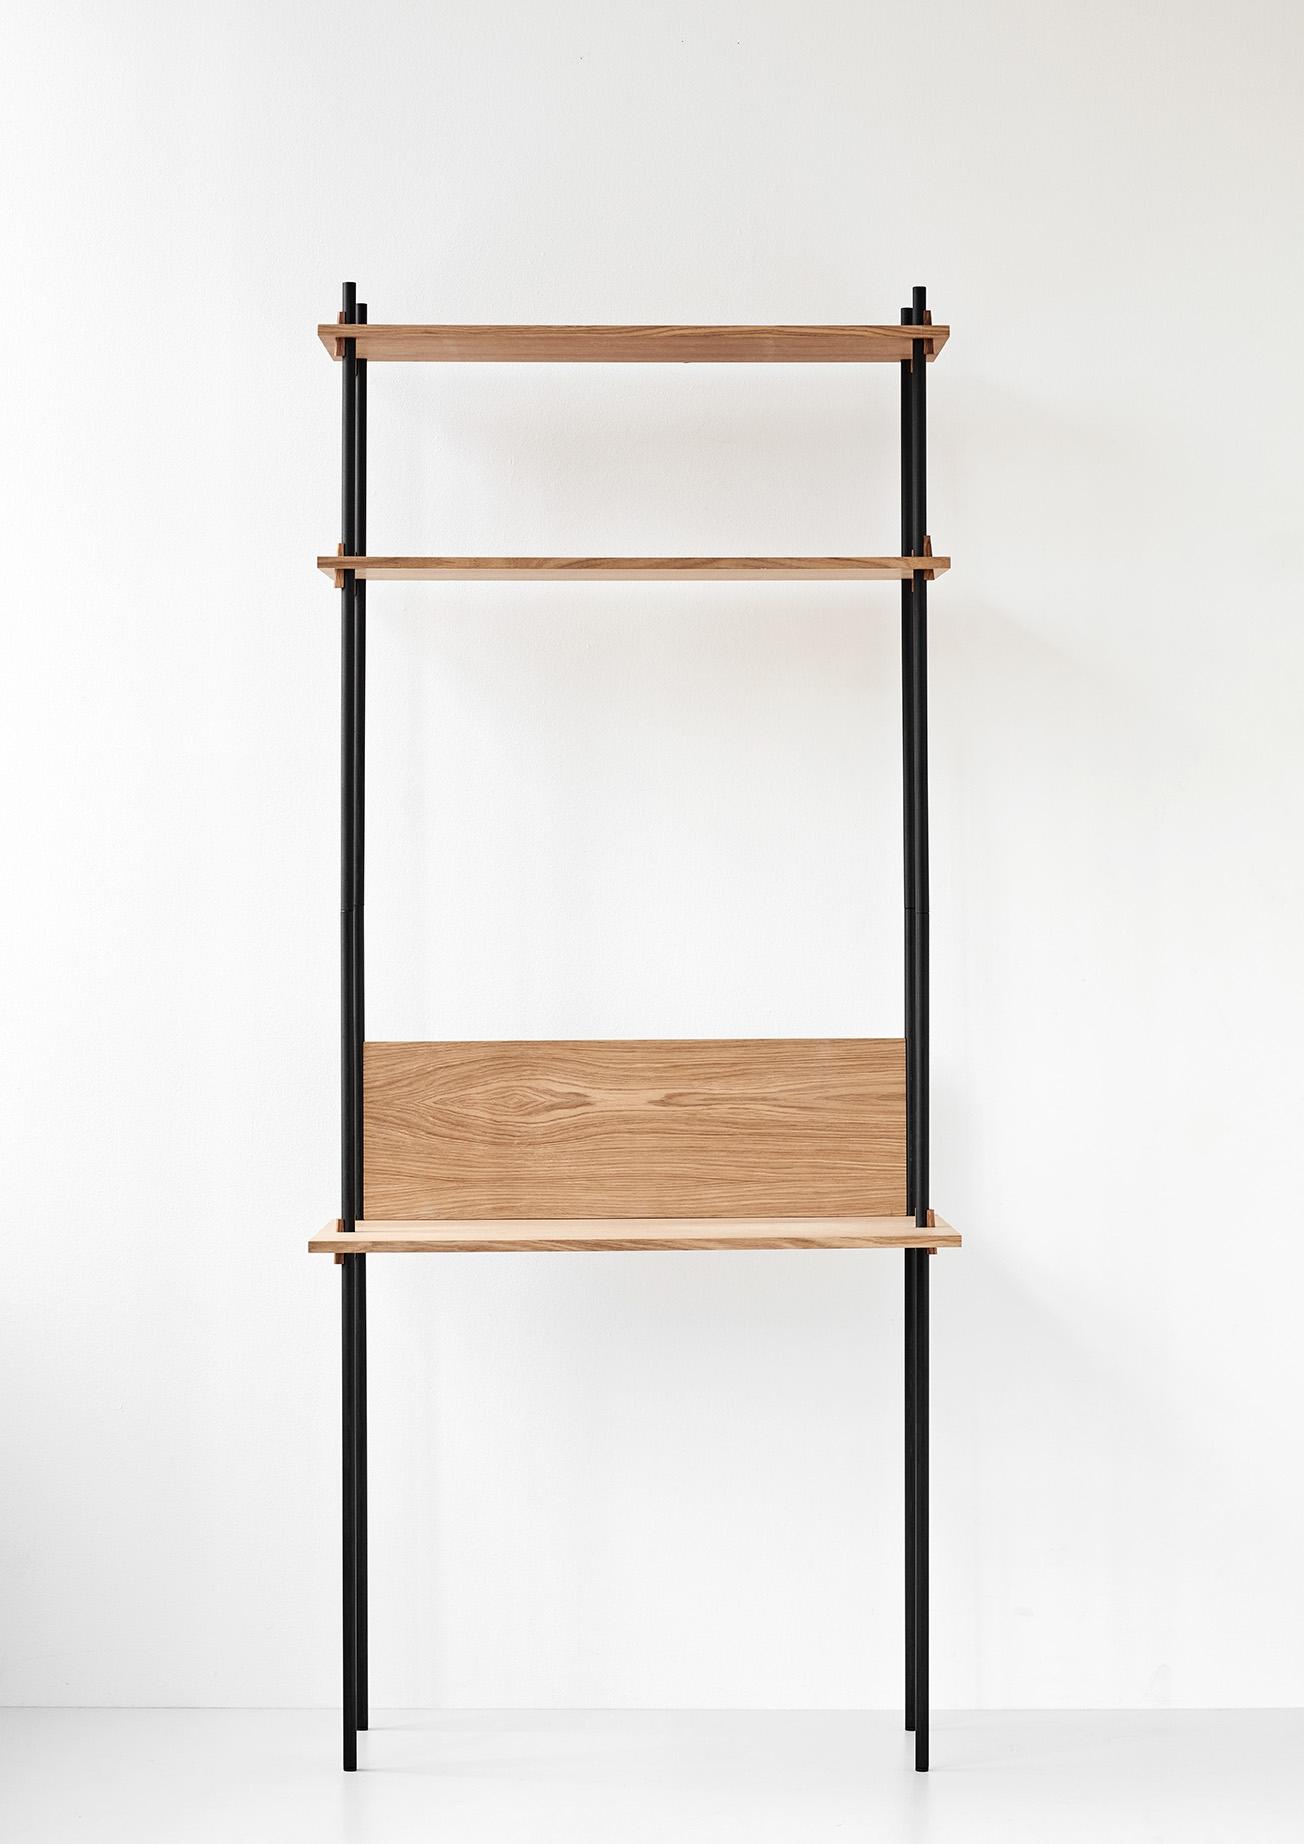 Moebe Shelving System Desk tall single set